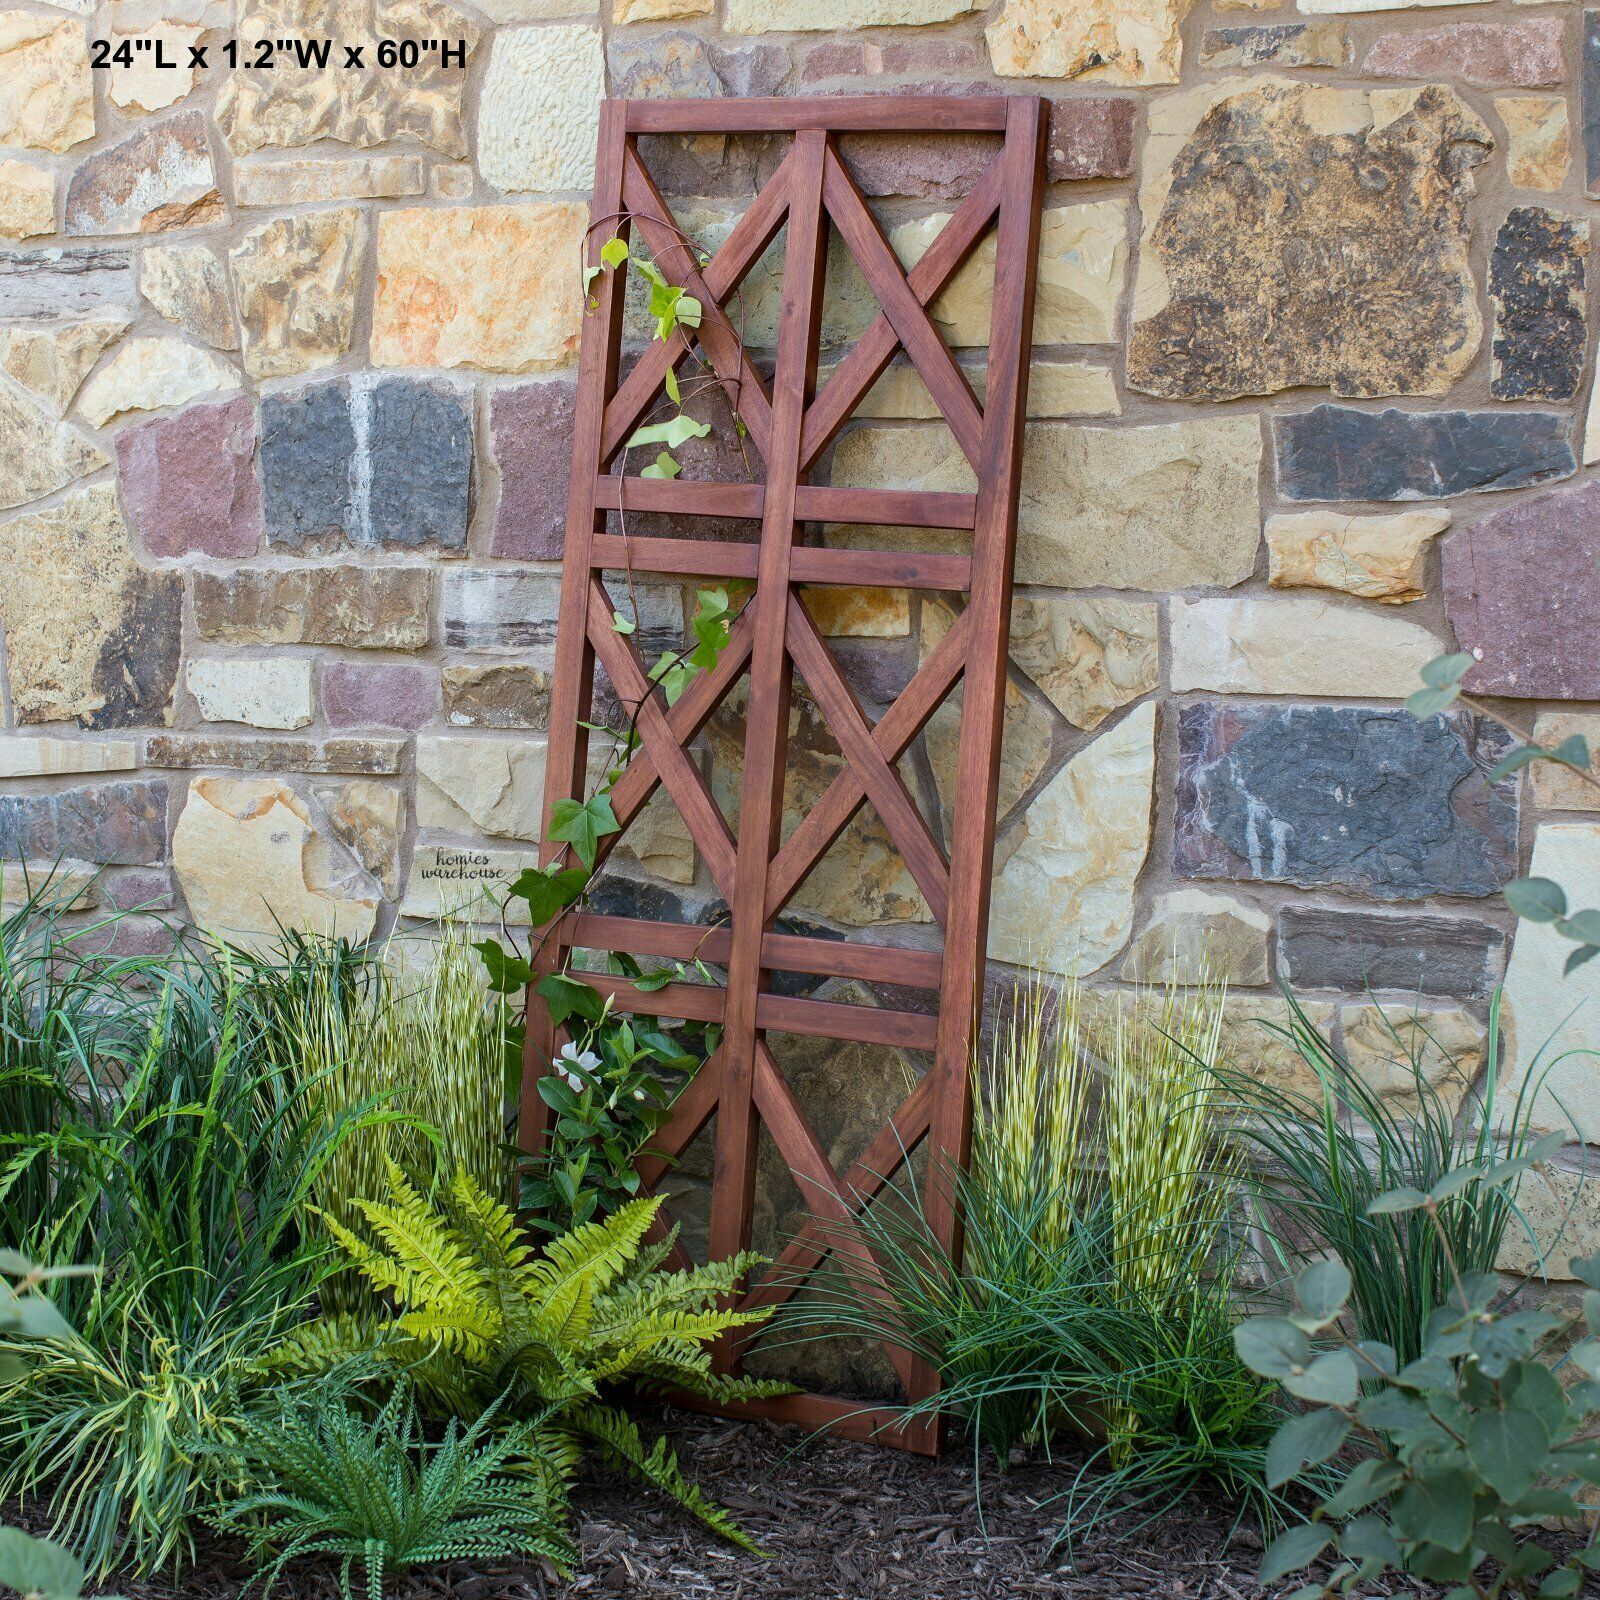 Garden Trellis Acacia Wood Wall Fence Outdoor Yard Art Decor